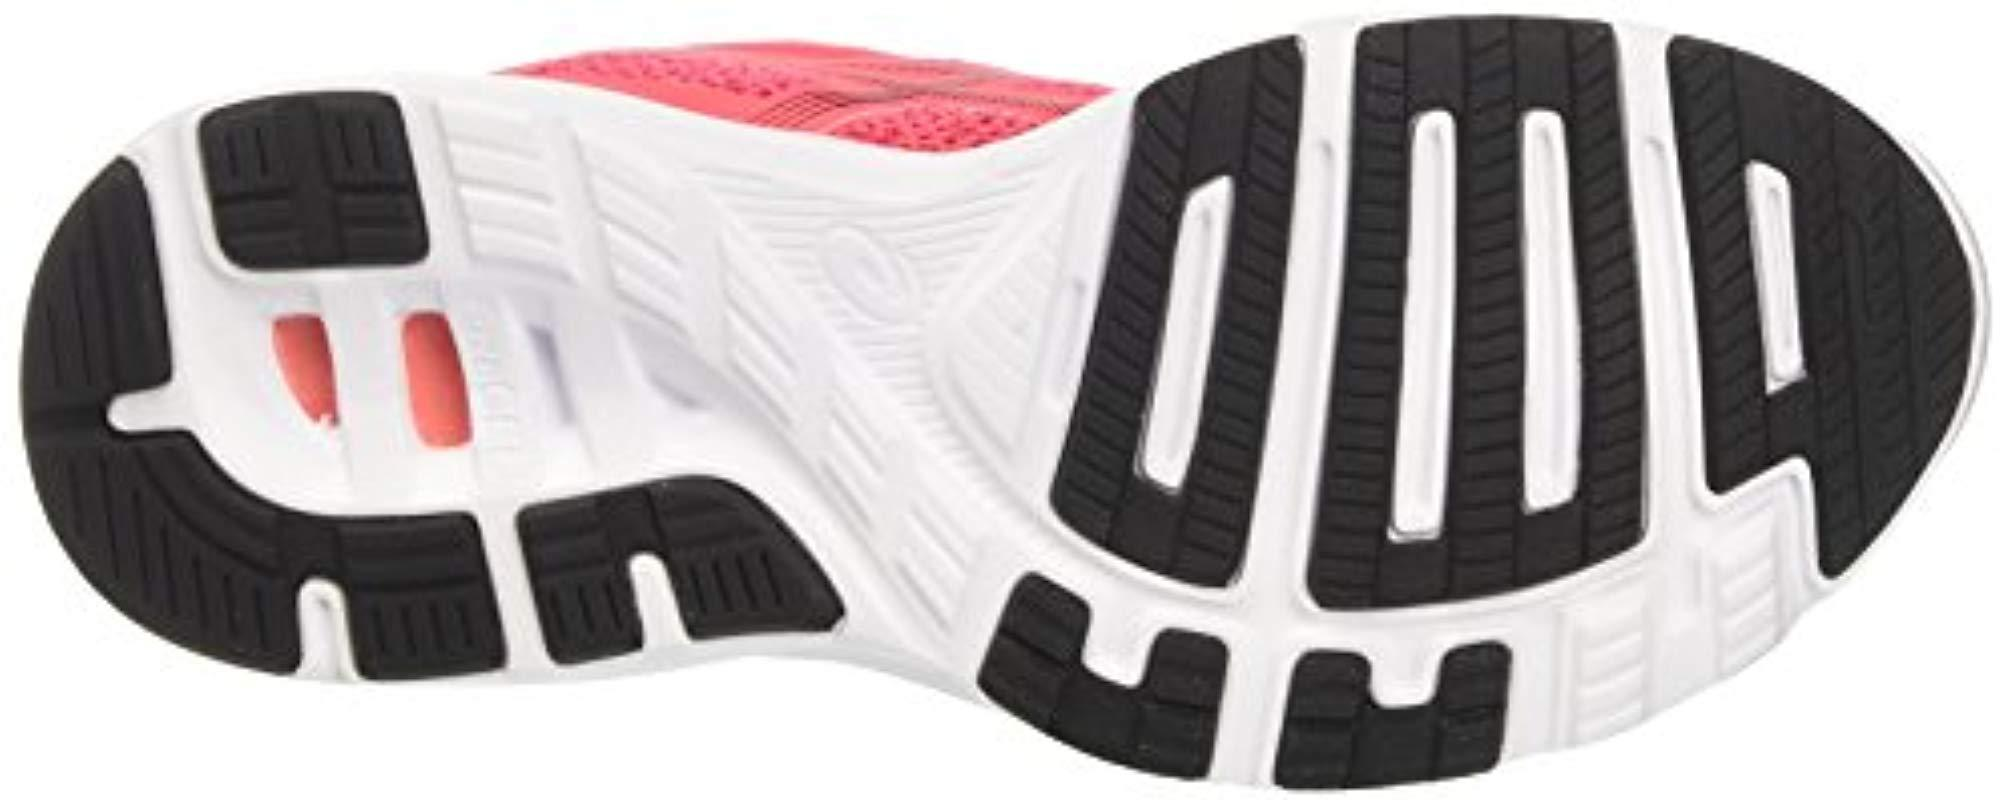 Training Shoes T6h8n 2090 Nitrofuze Nitrofuze Training 2090 T6h8n trshxCQd